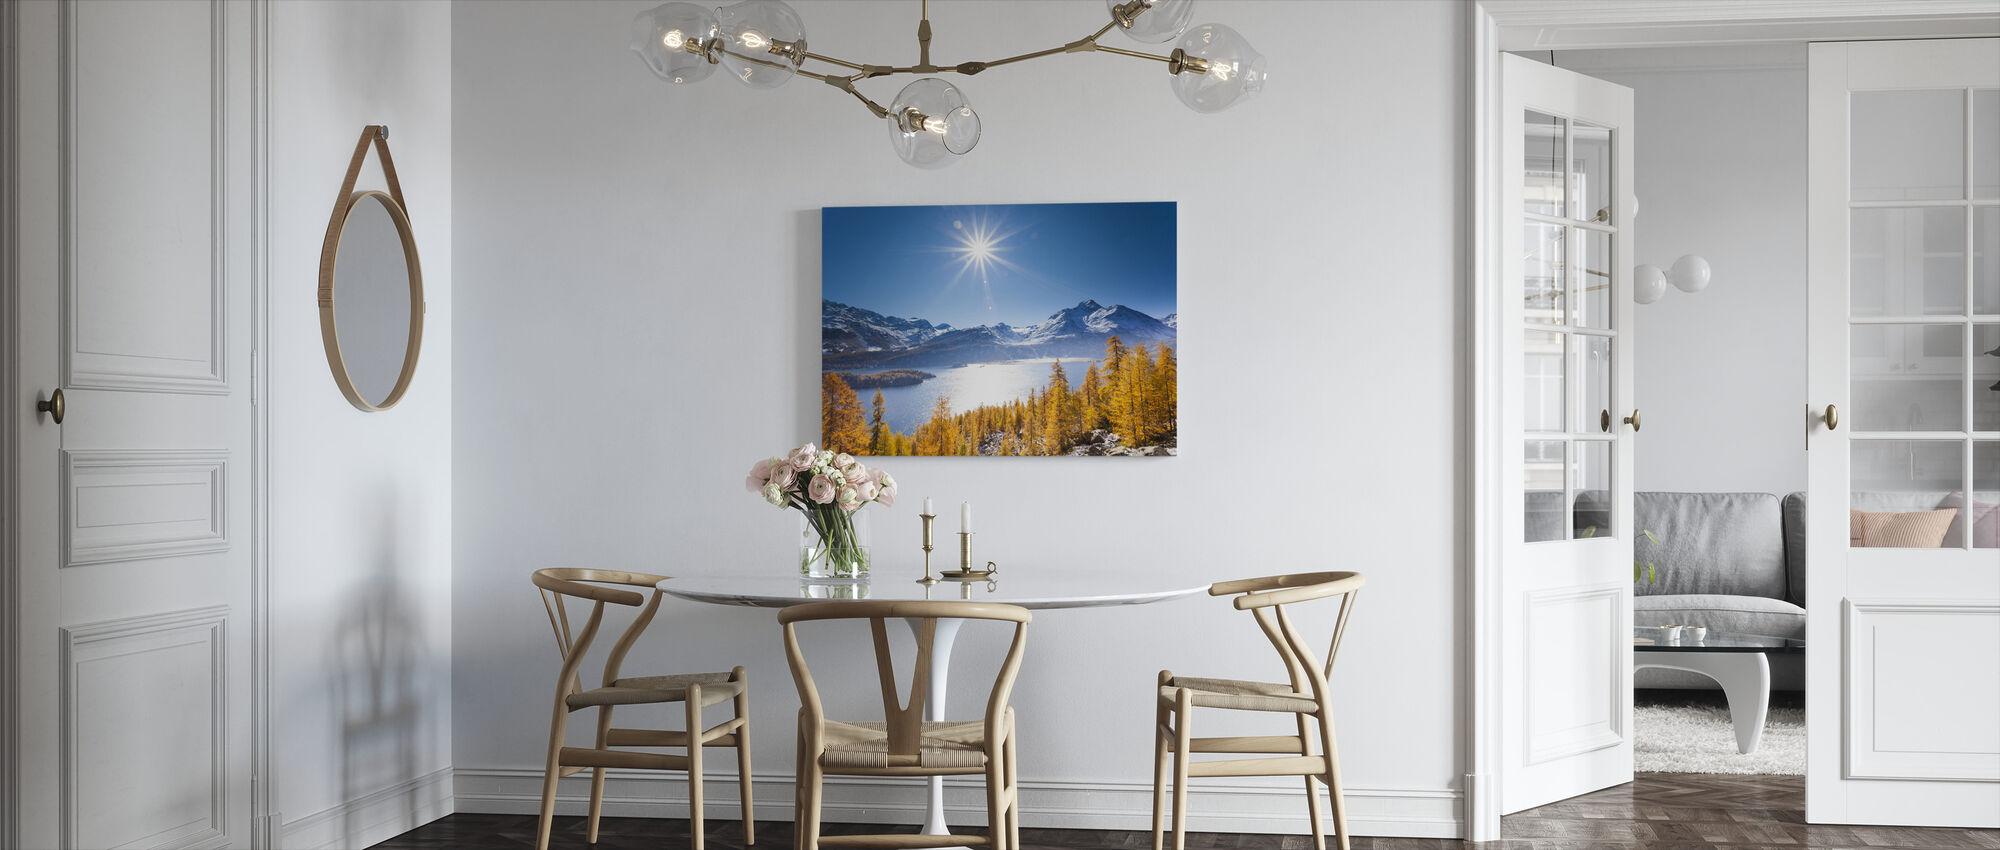 Graubunden, Schweiz - Canvastavla - Kök